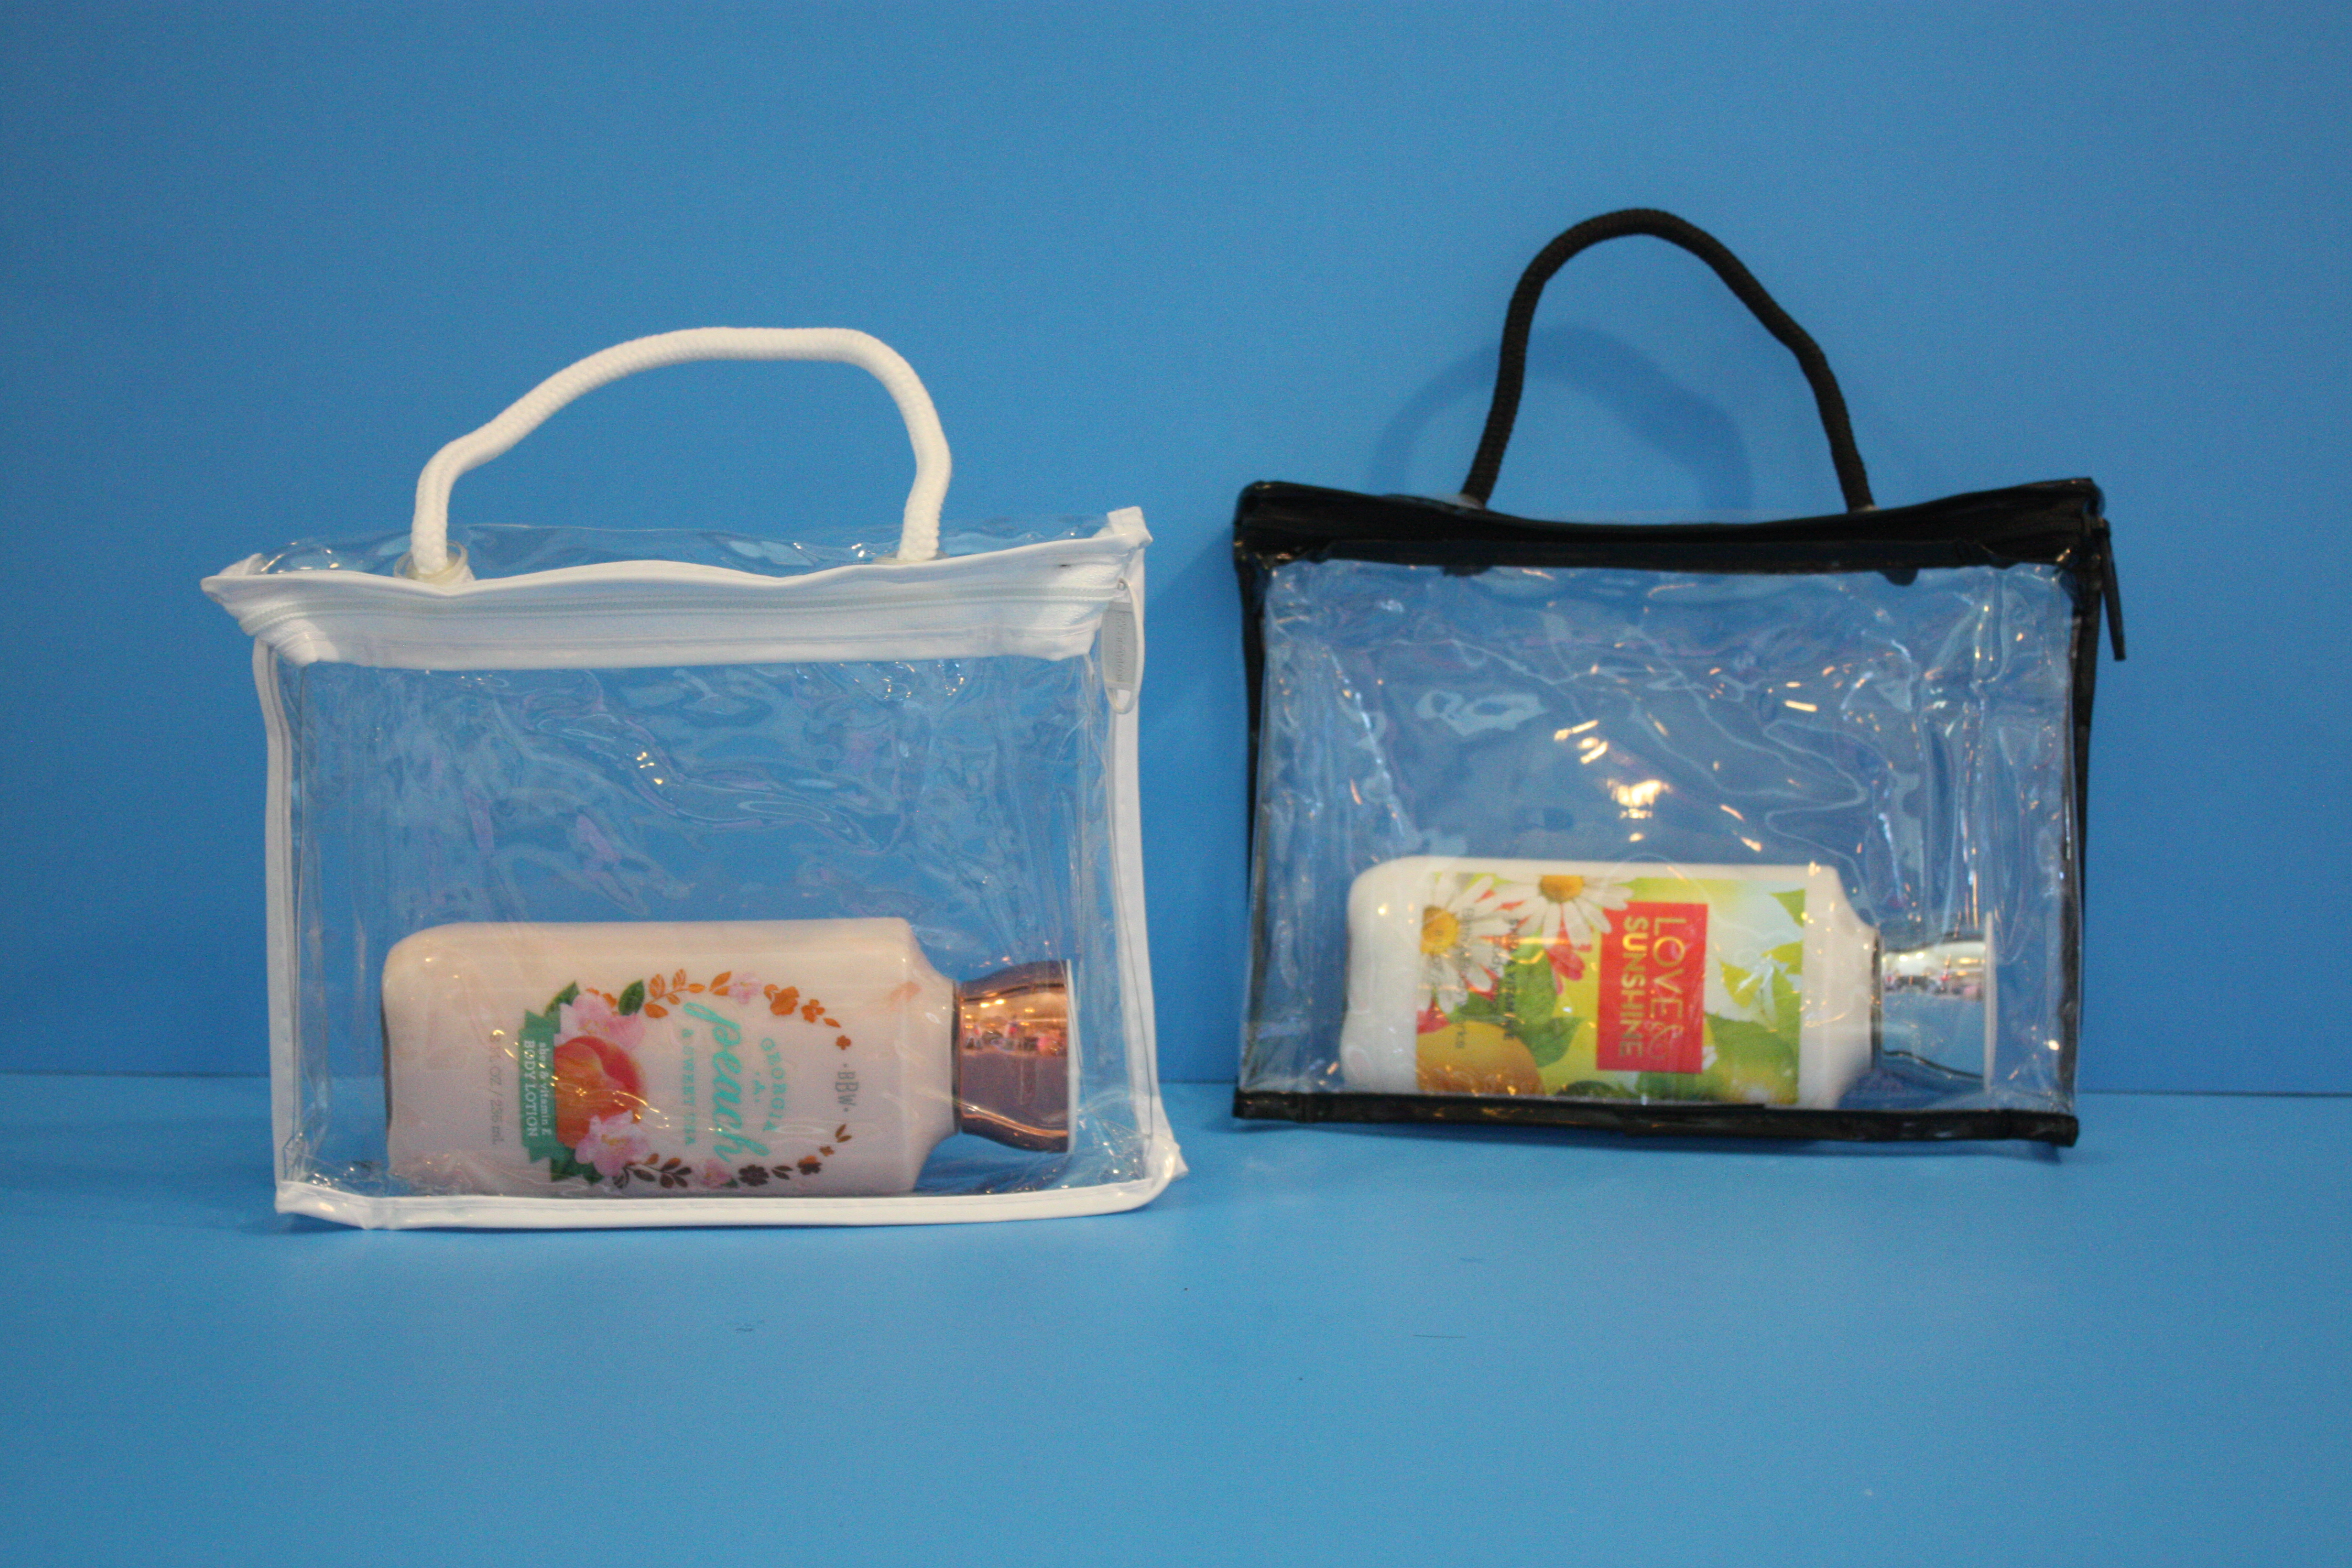 Sewing Vinyl Bags Zipper Pouch Vinyl Bags With Zipper Rople Handle Custom Vinyl Bags